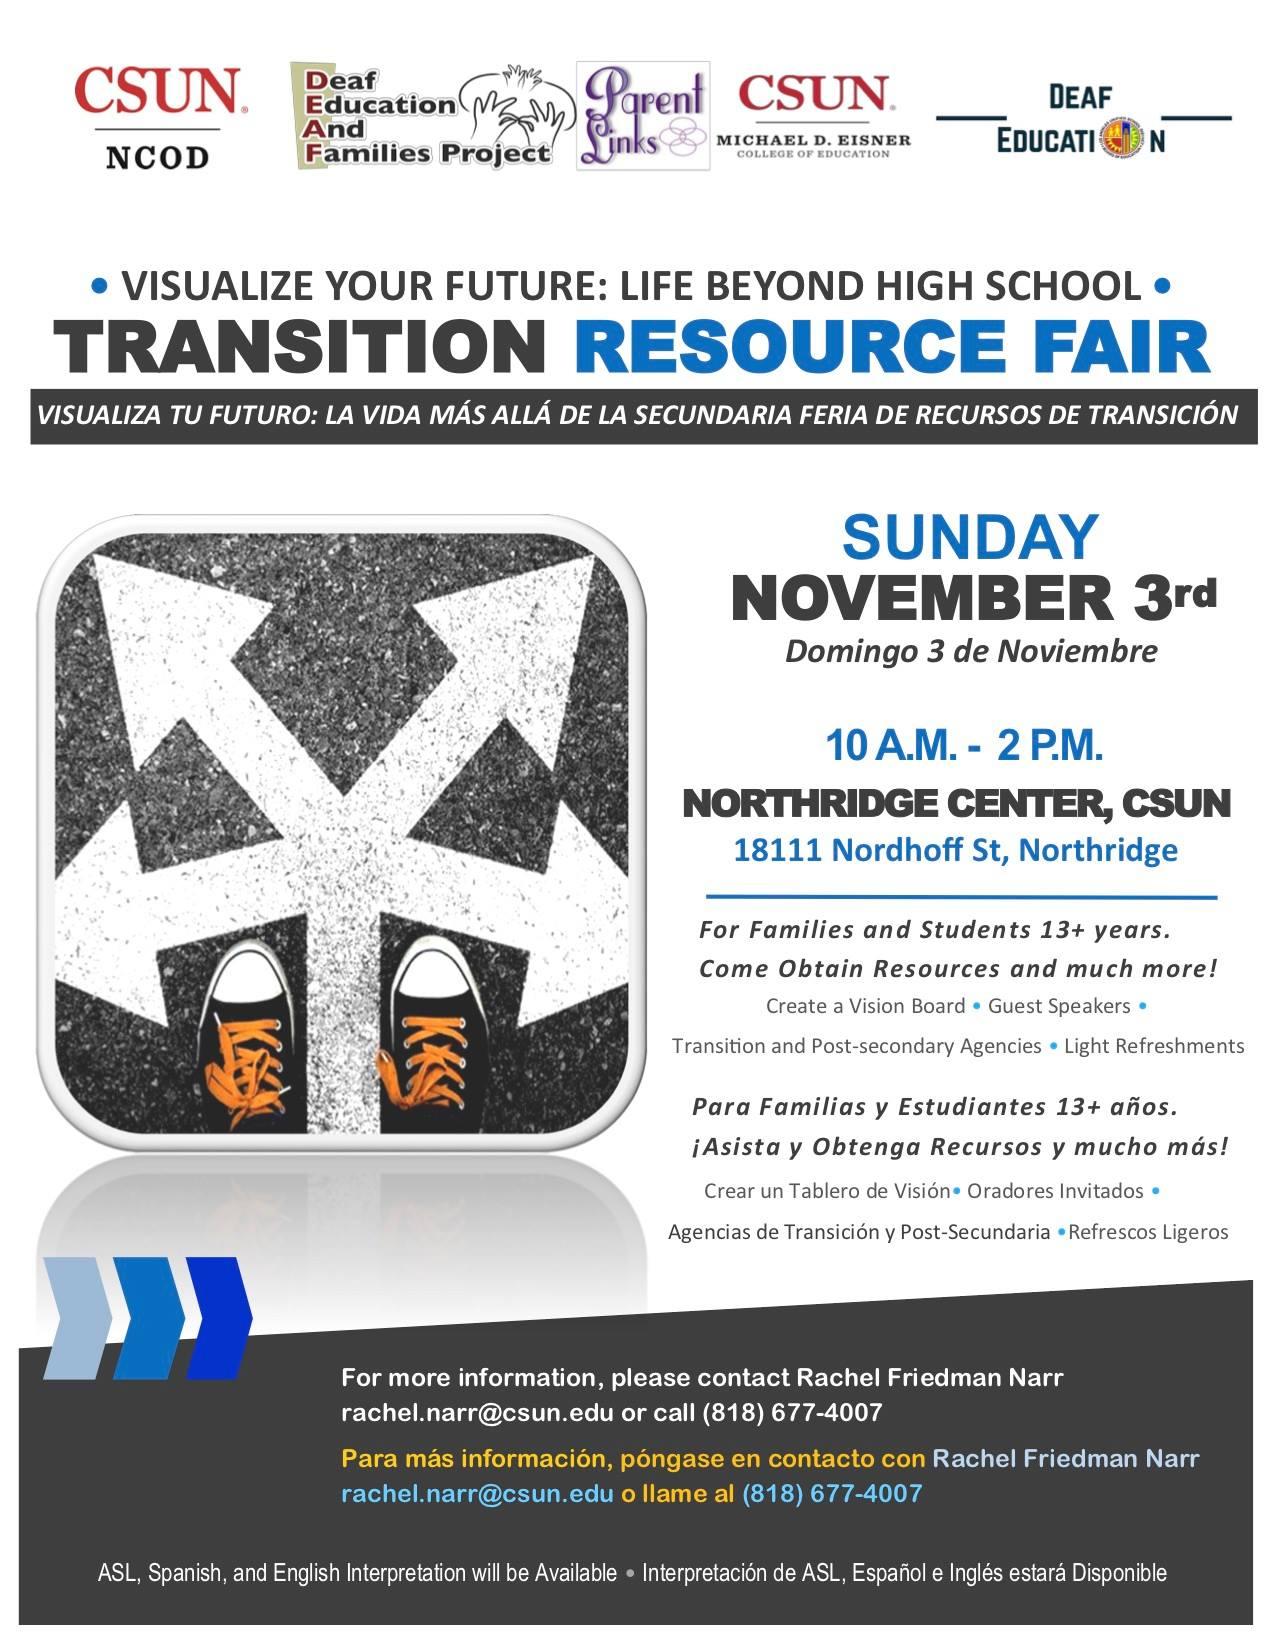 Transition Resource Fair